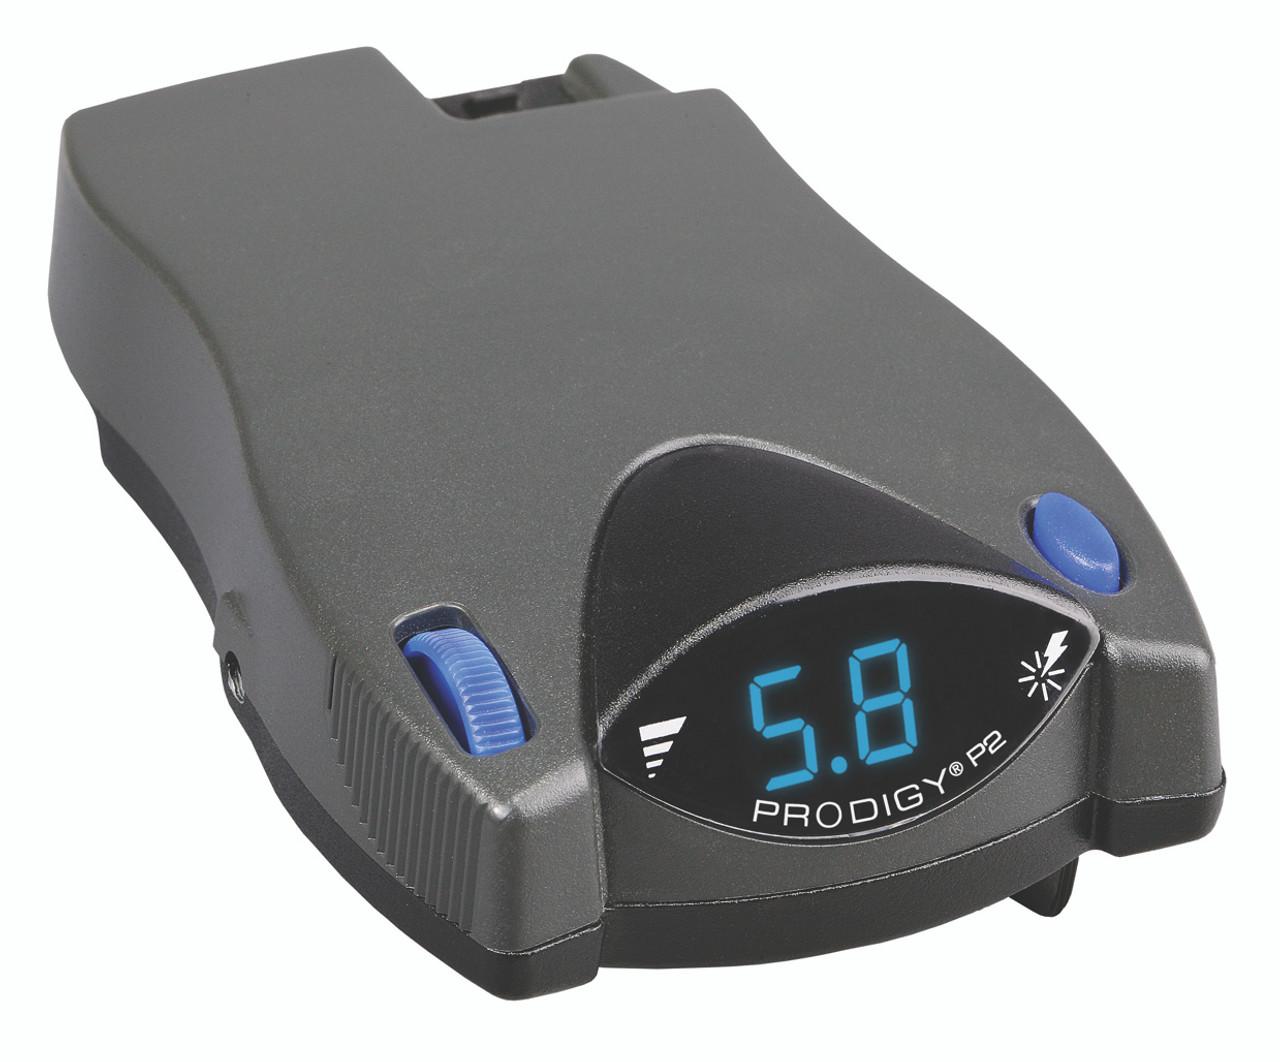 90885 --- Tekonsha Prodigy P2 Proportional Brake Controller - 2, 4, 6 & 8 Brake Systems